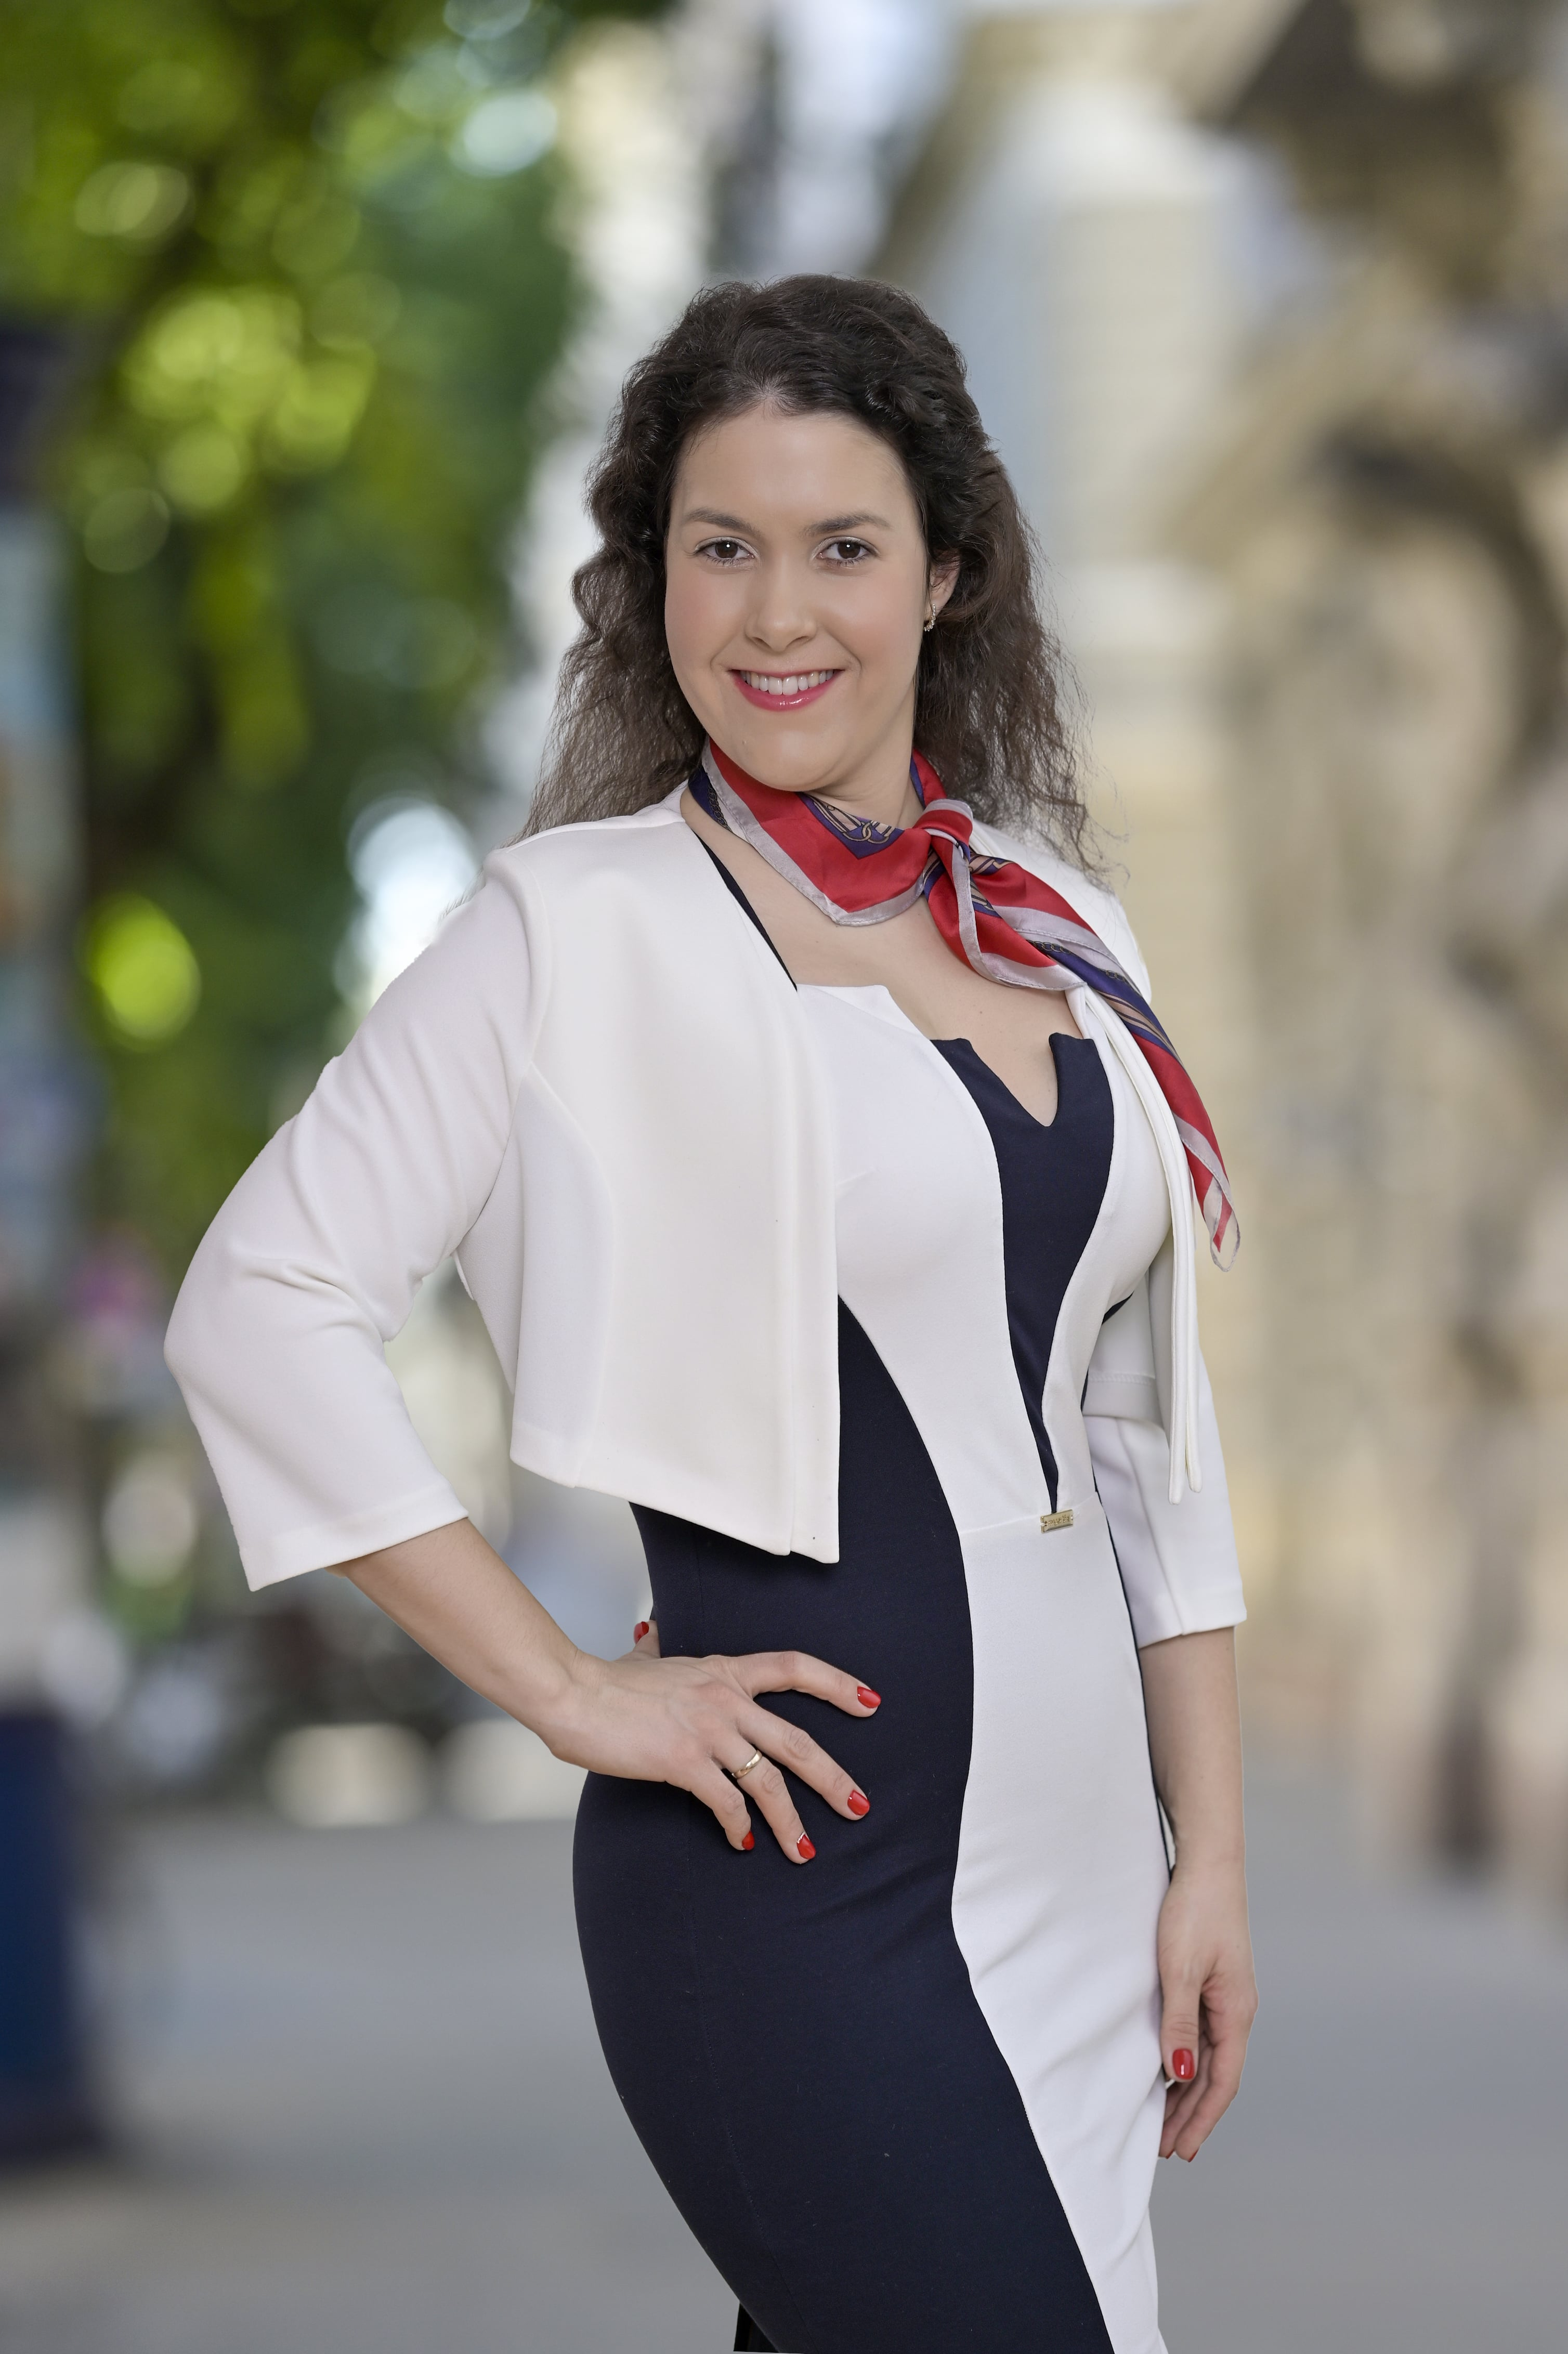 Dorisz Sofija Dr. Csubákné Székely